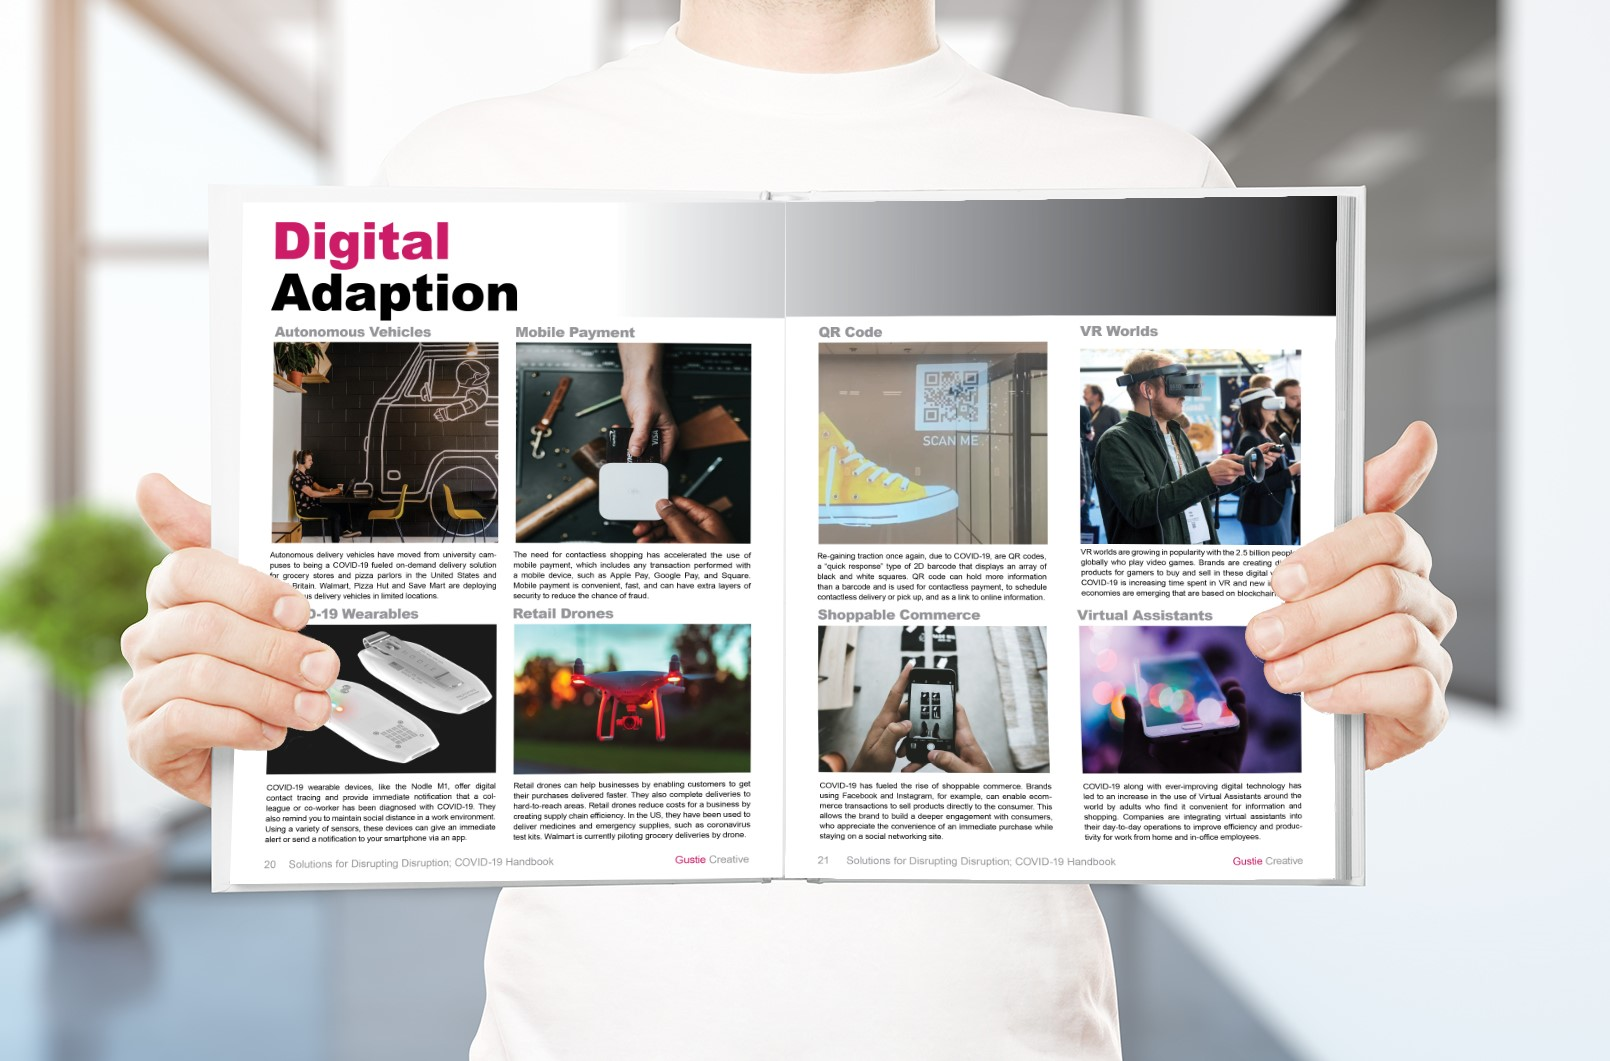 Solutions for Disrupting Disruption, COVID-19 Handbook, Digital Adaption Spread